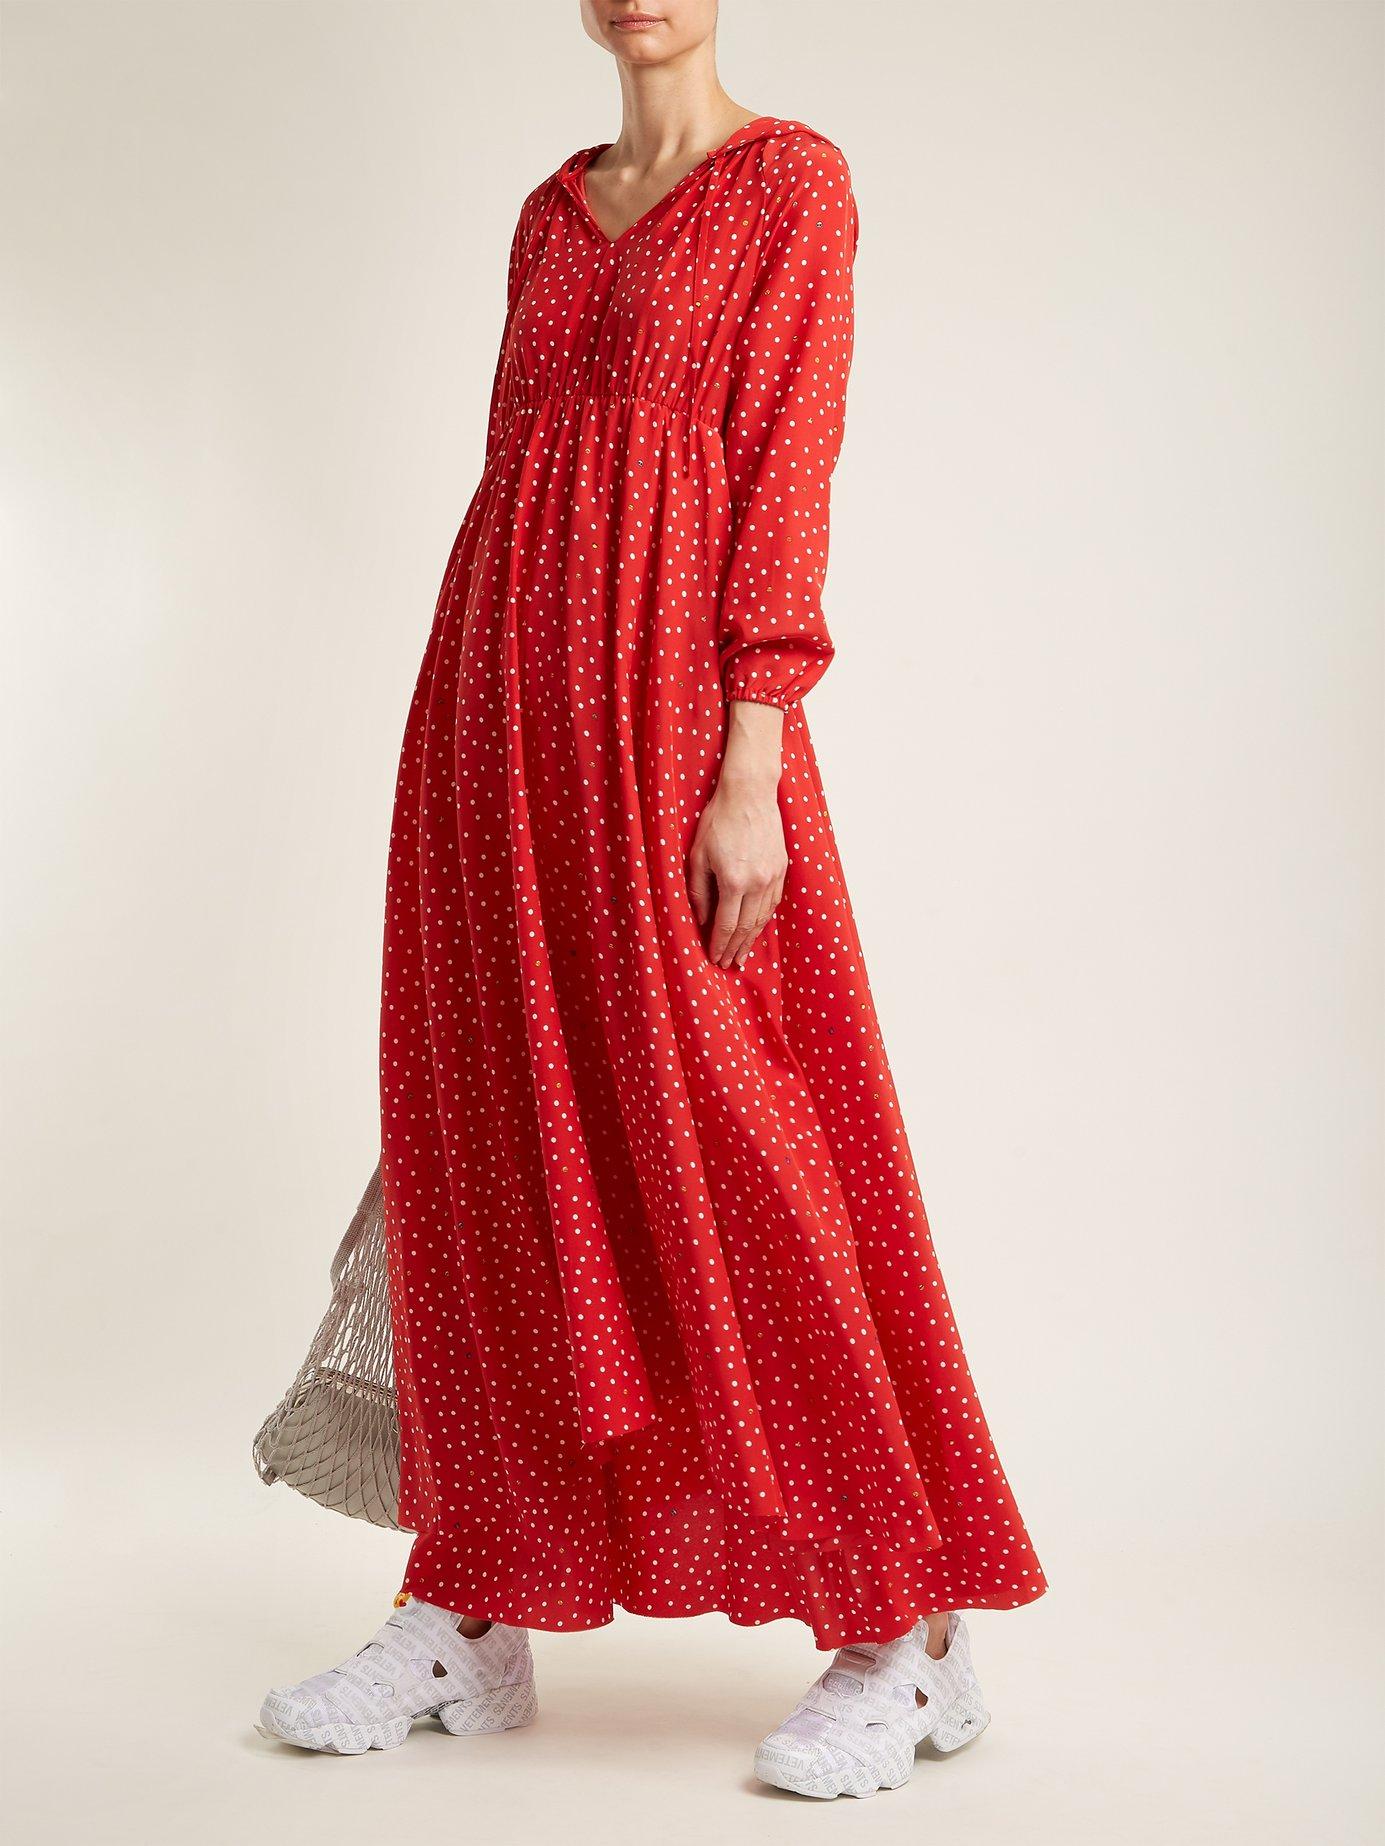 Polka-dot and Emjoi-print hooded silk dress by Vetements